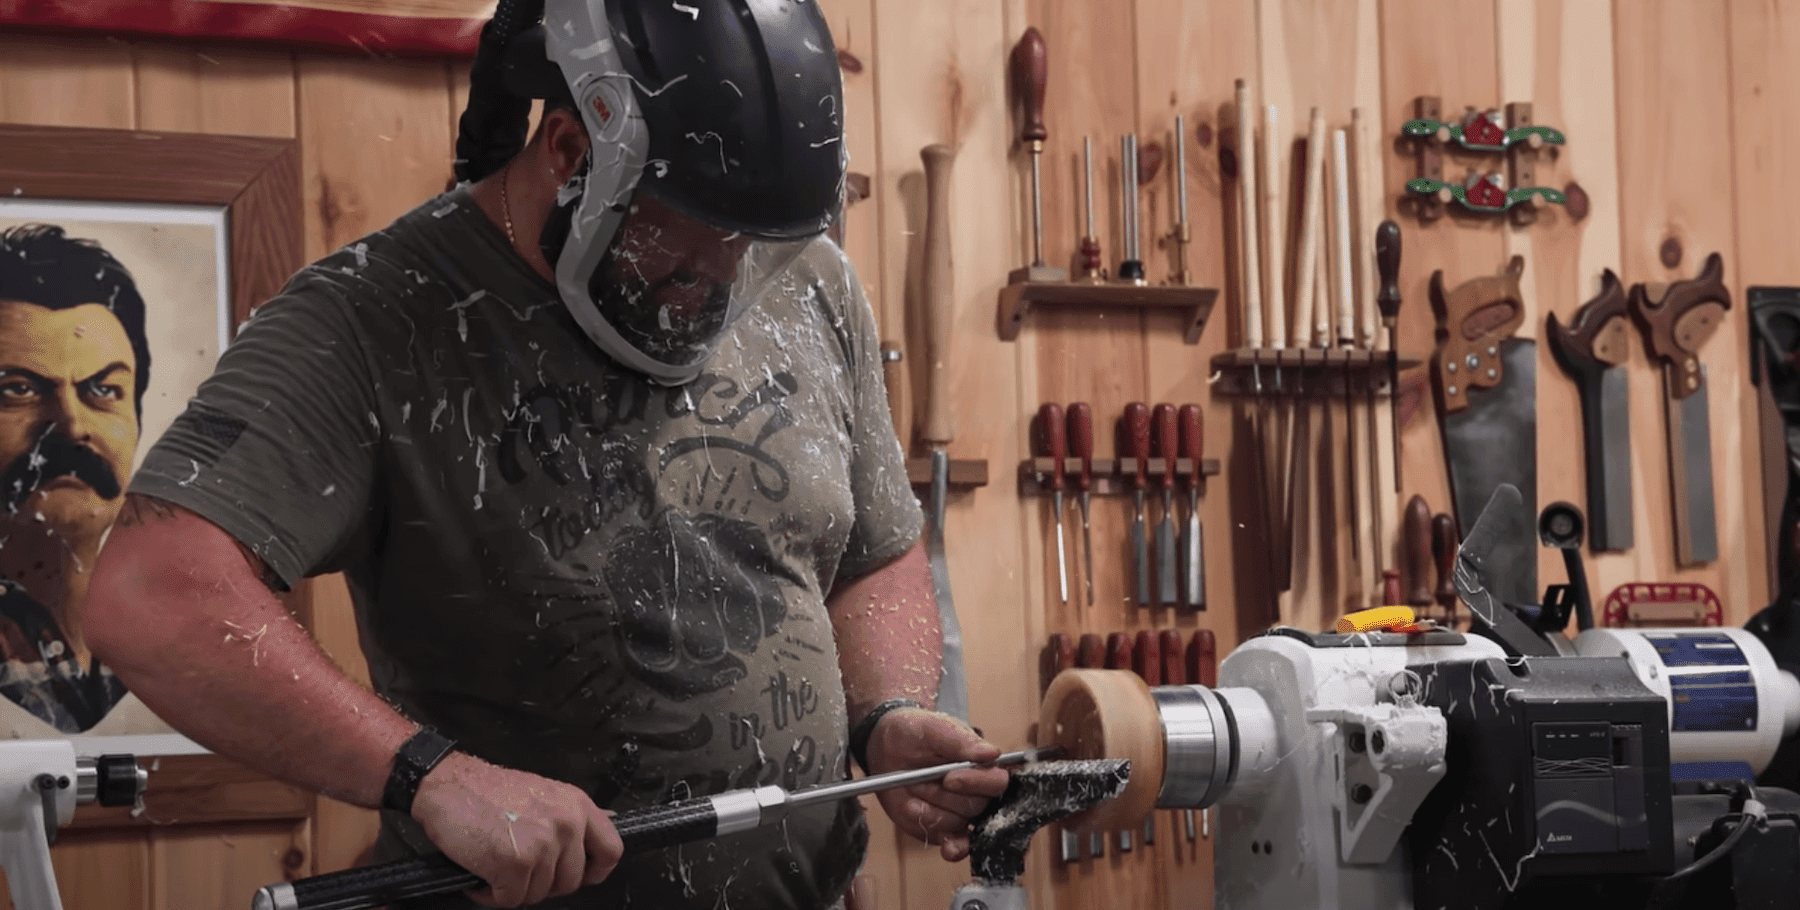 John Malecki creating a bowl shape